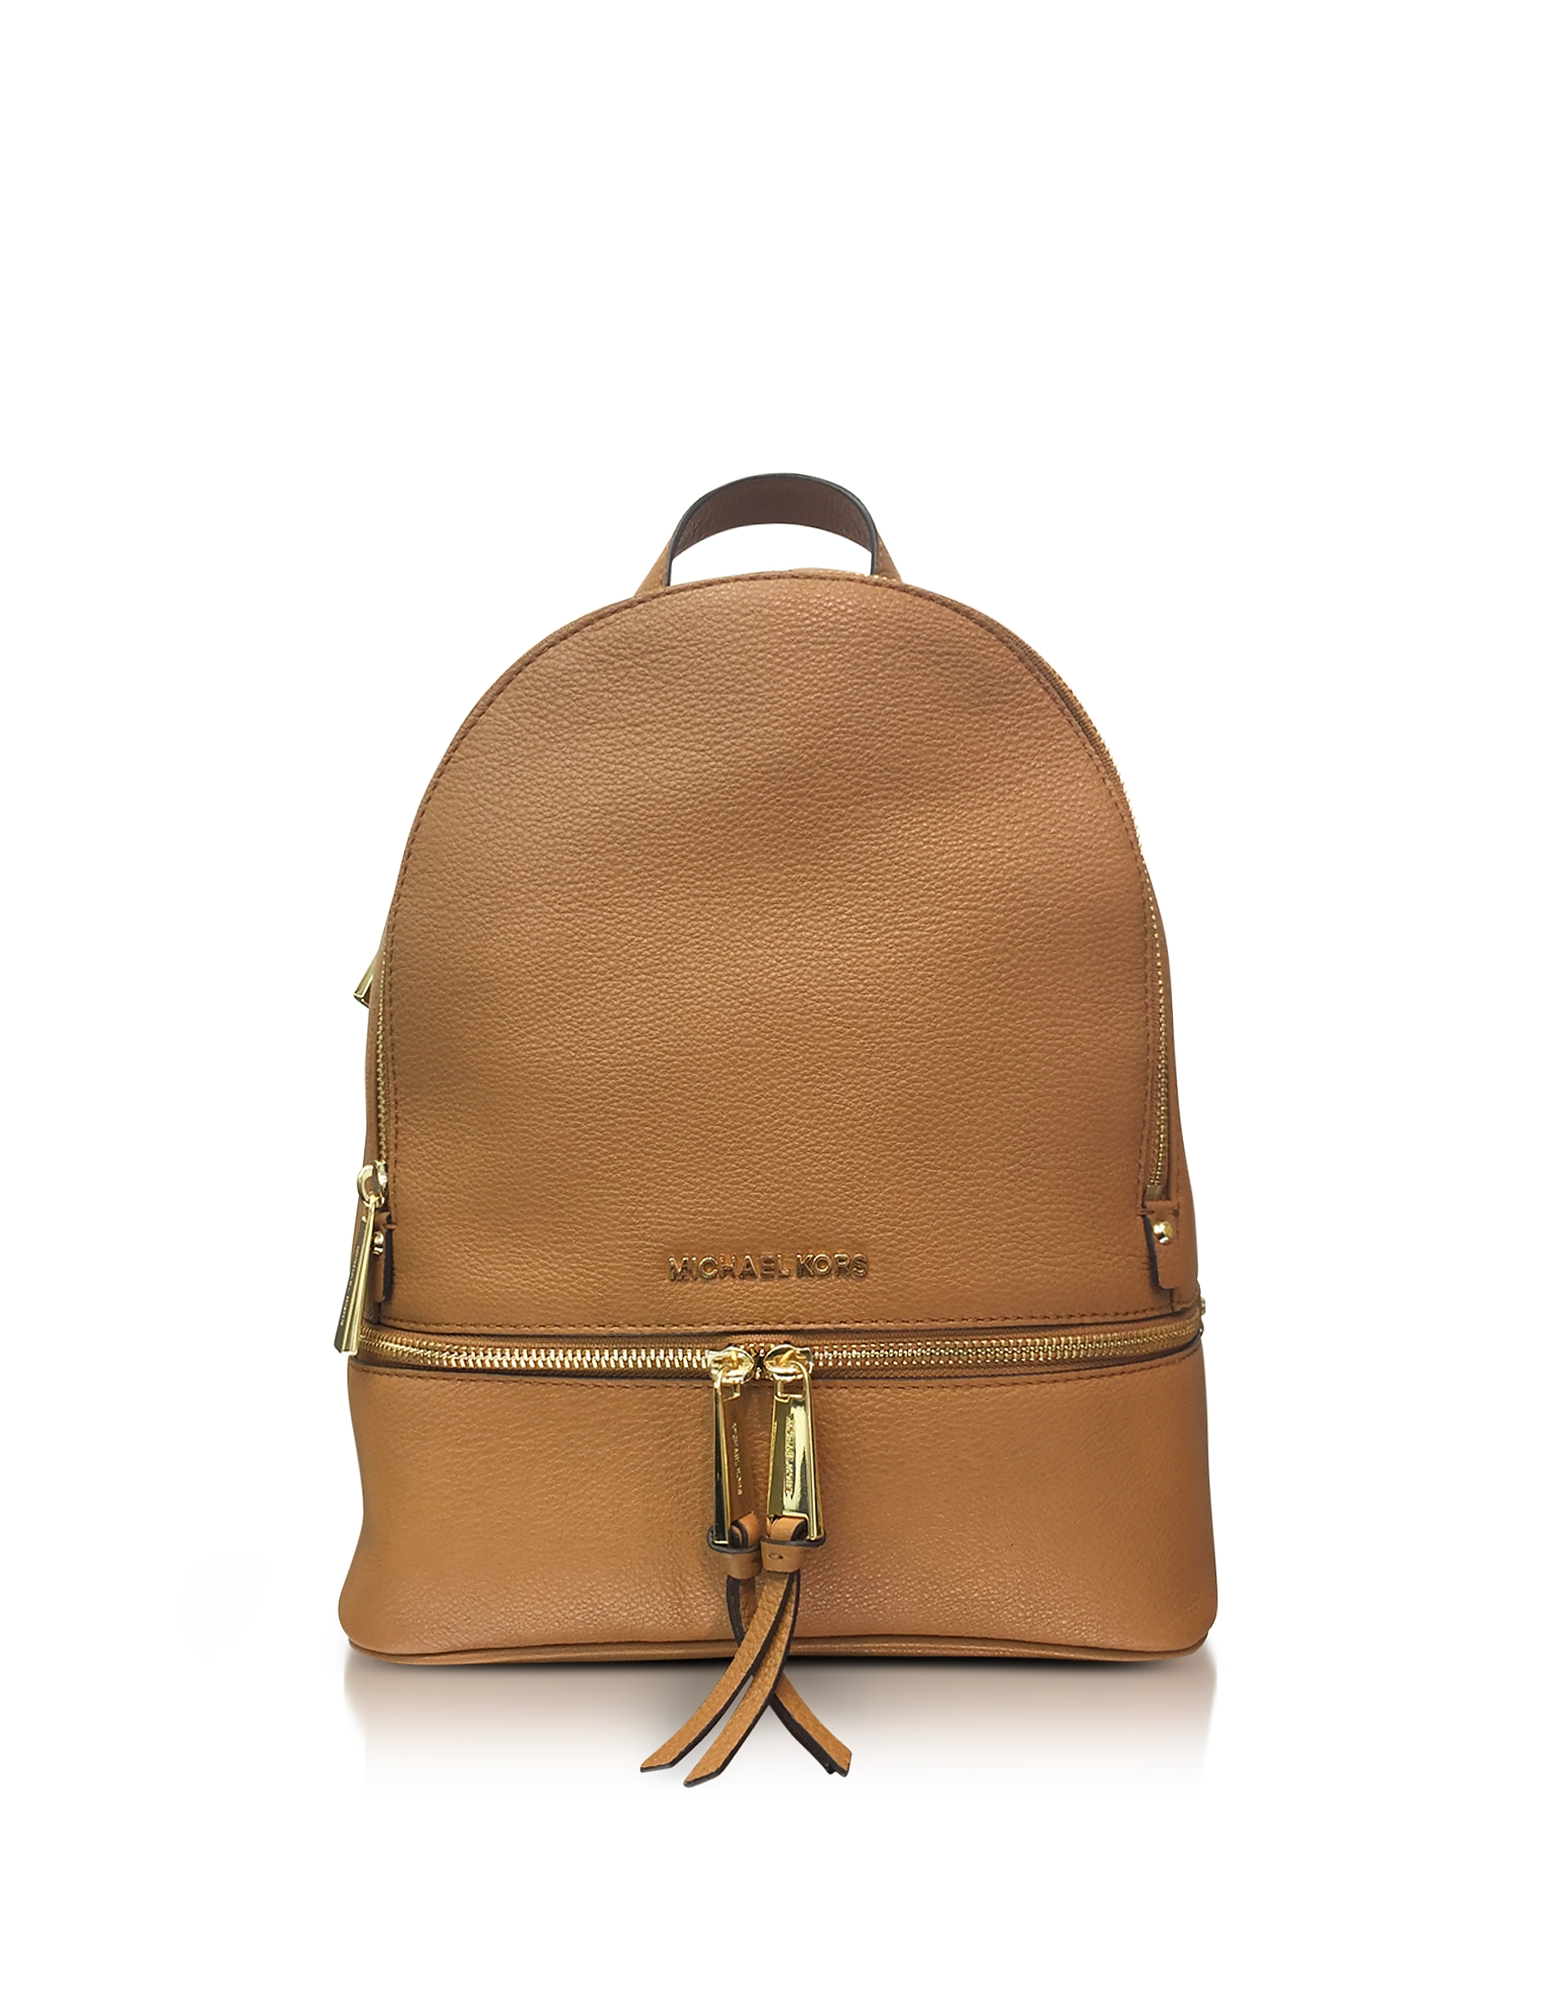 Michael Kors Handbags, Rhea Zip Medium Luggage Leather Backpack